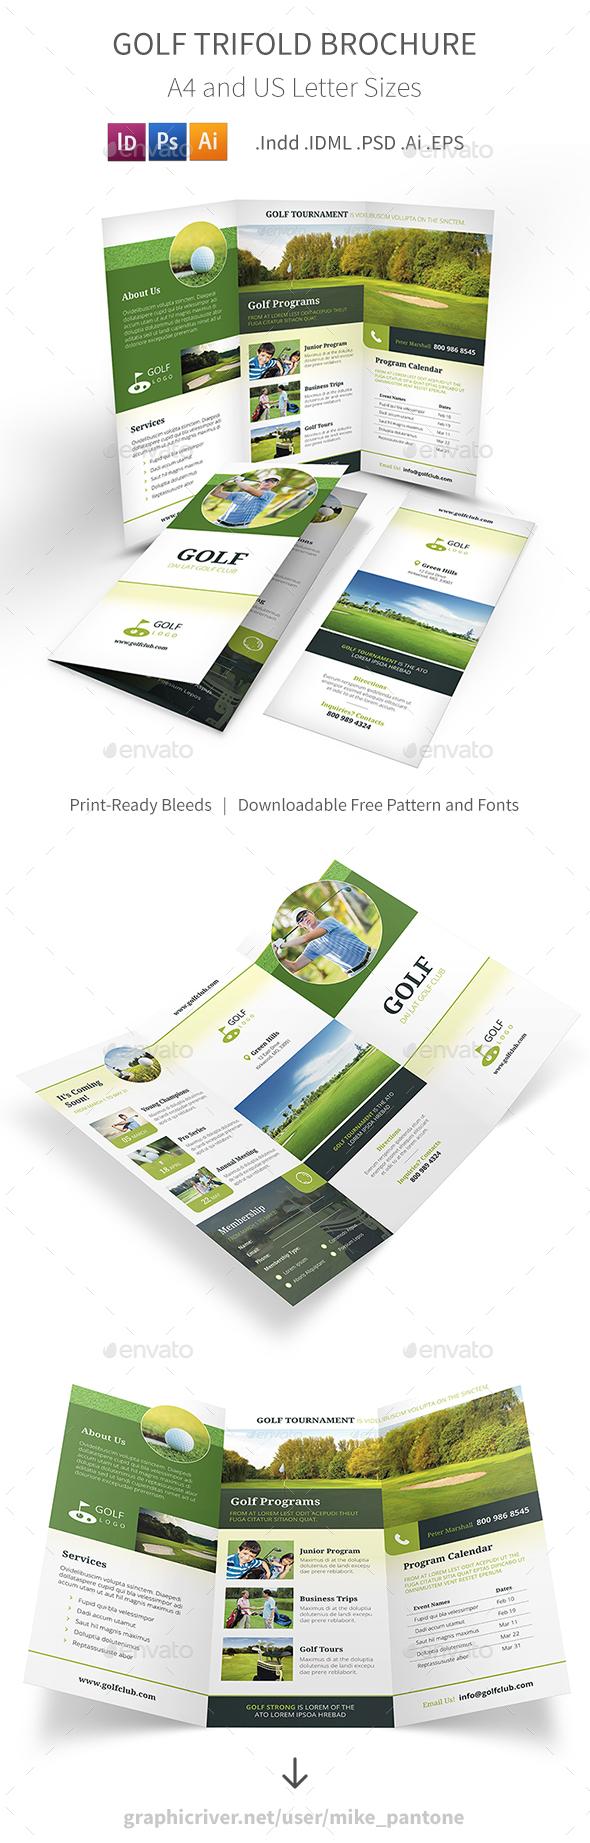 Golf Trifold Brochure 5 - Informational Brochures